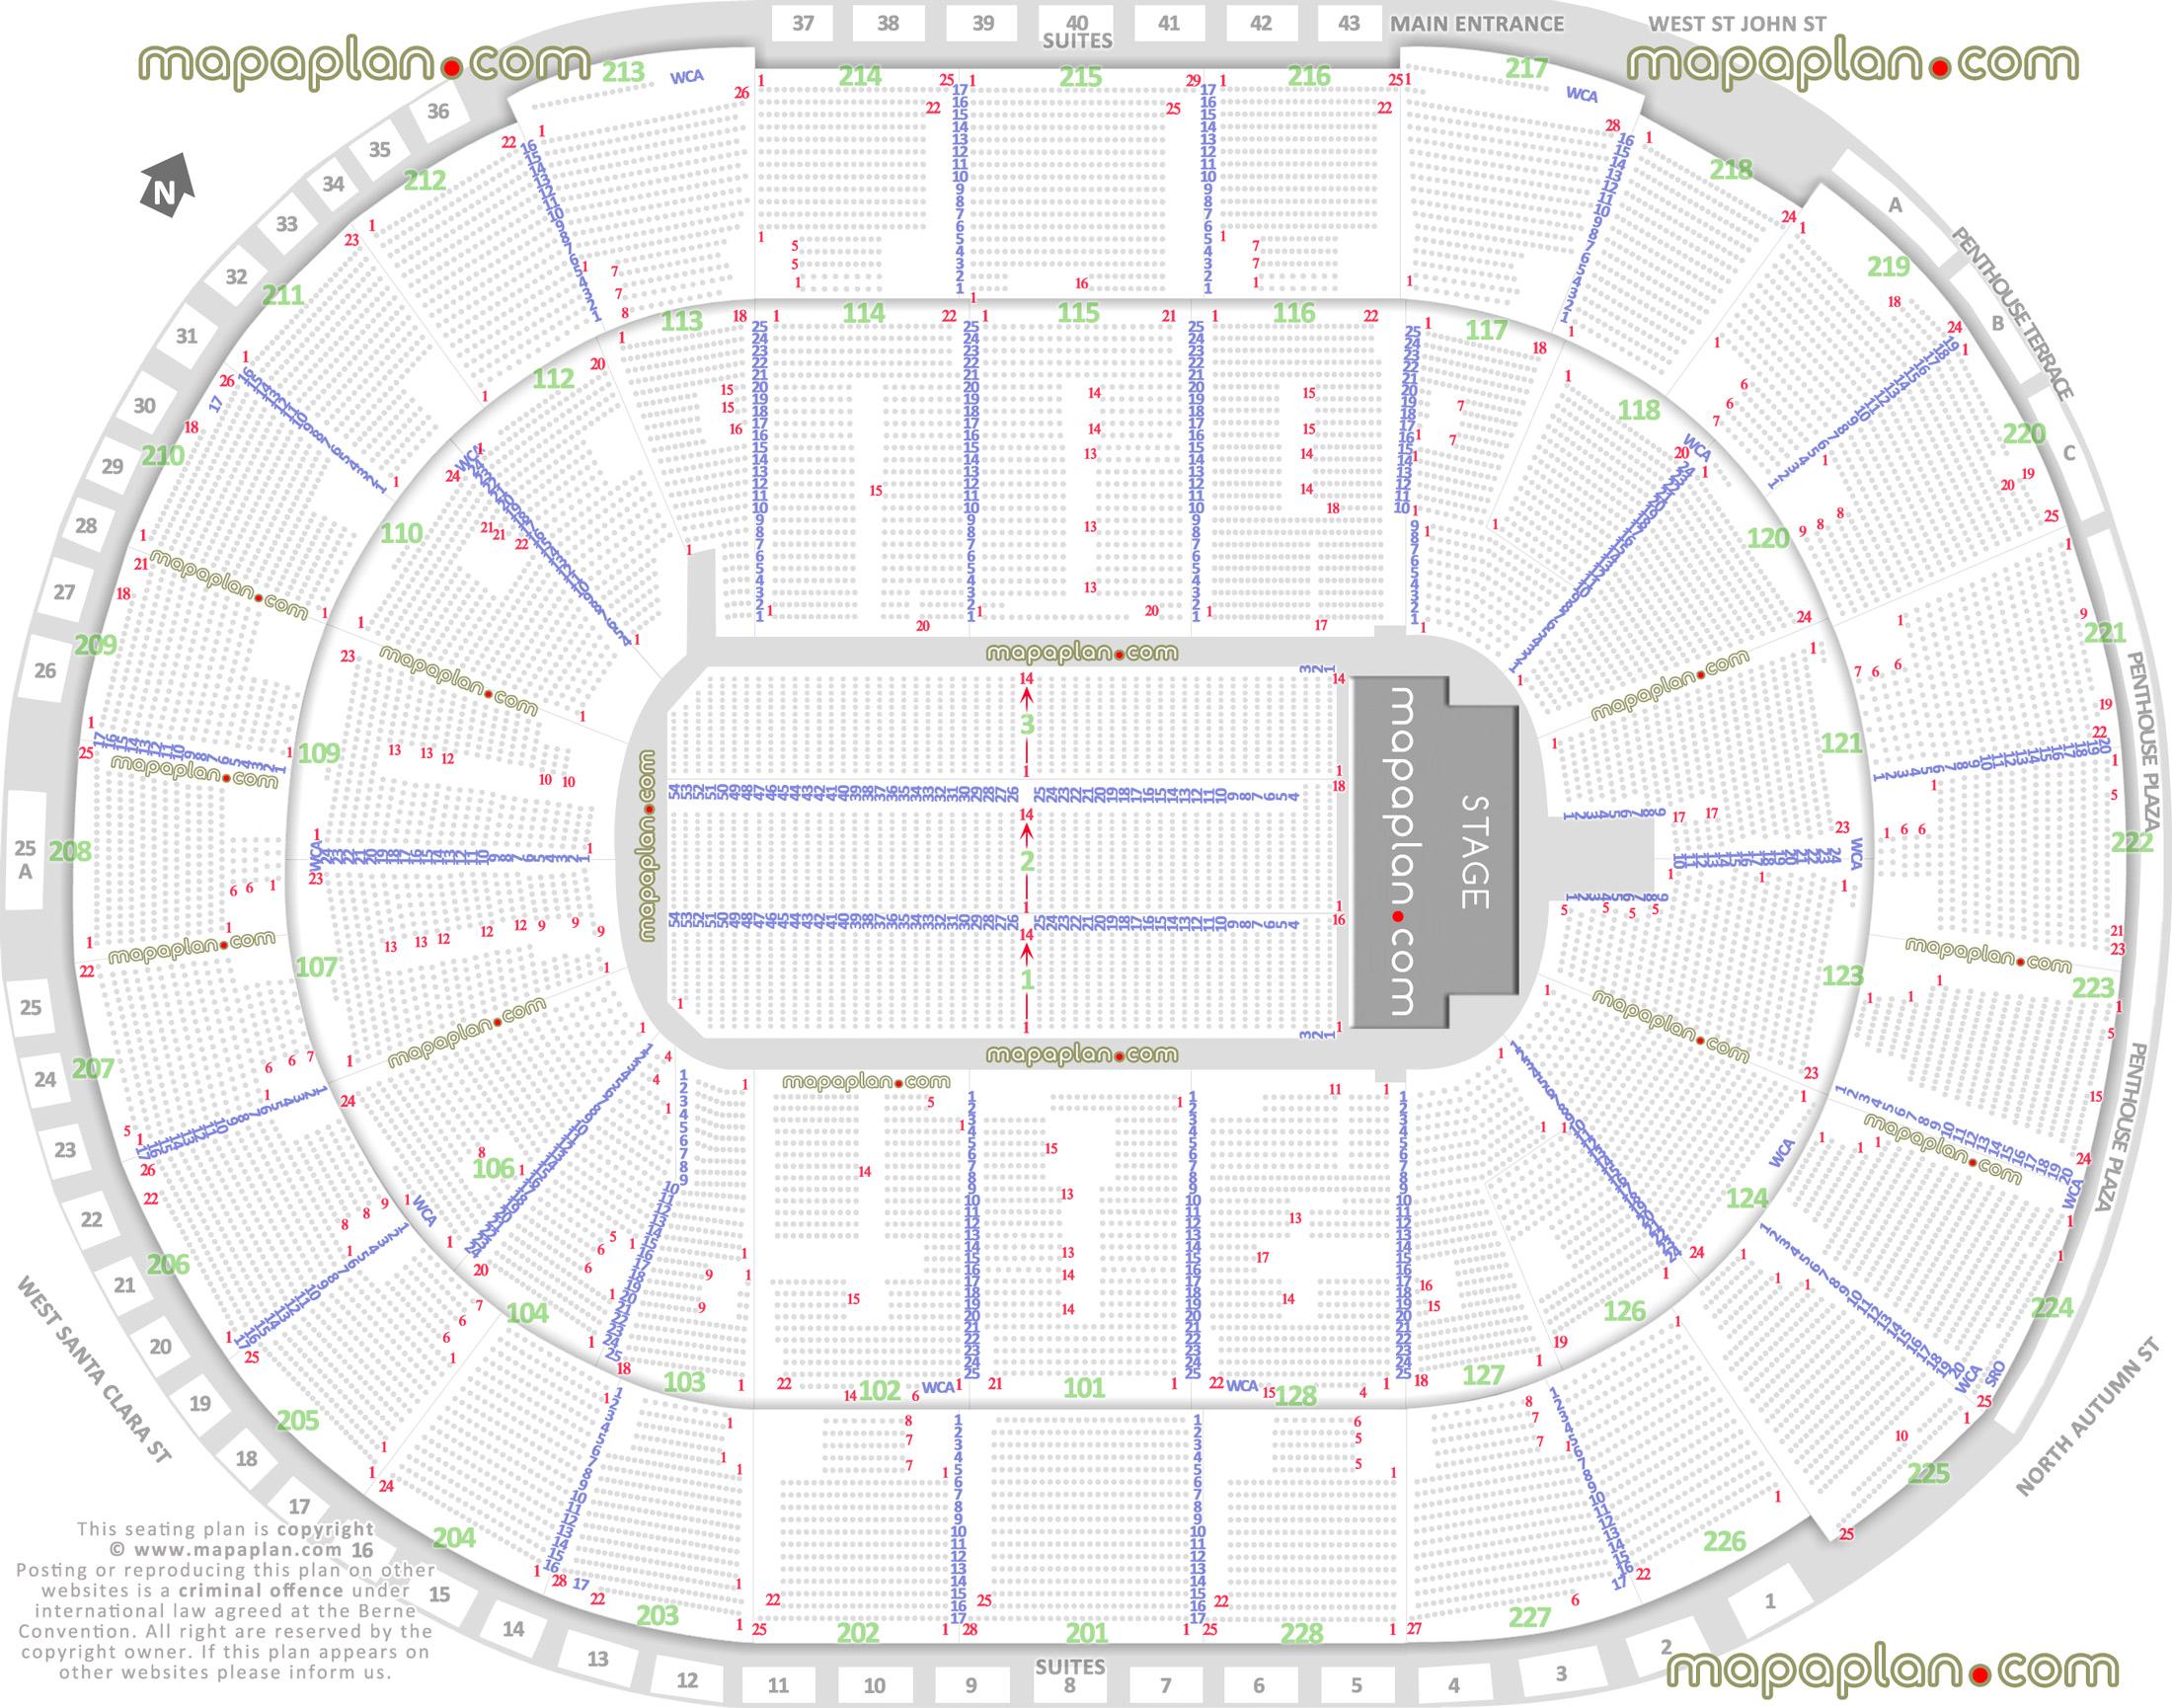 Sap Center Seat Map SAP Center seat & row numbers detailed seating chart, San Jose